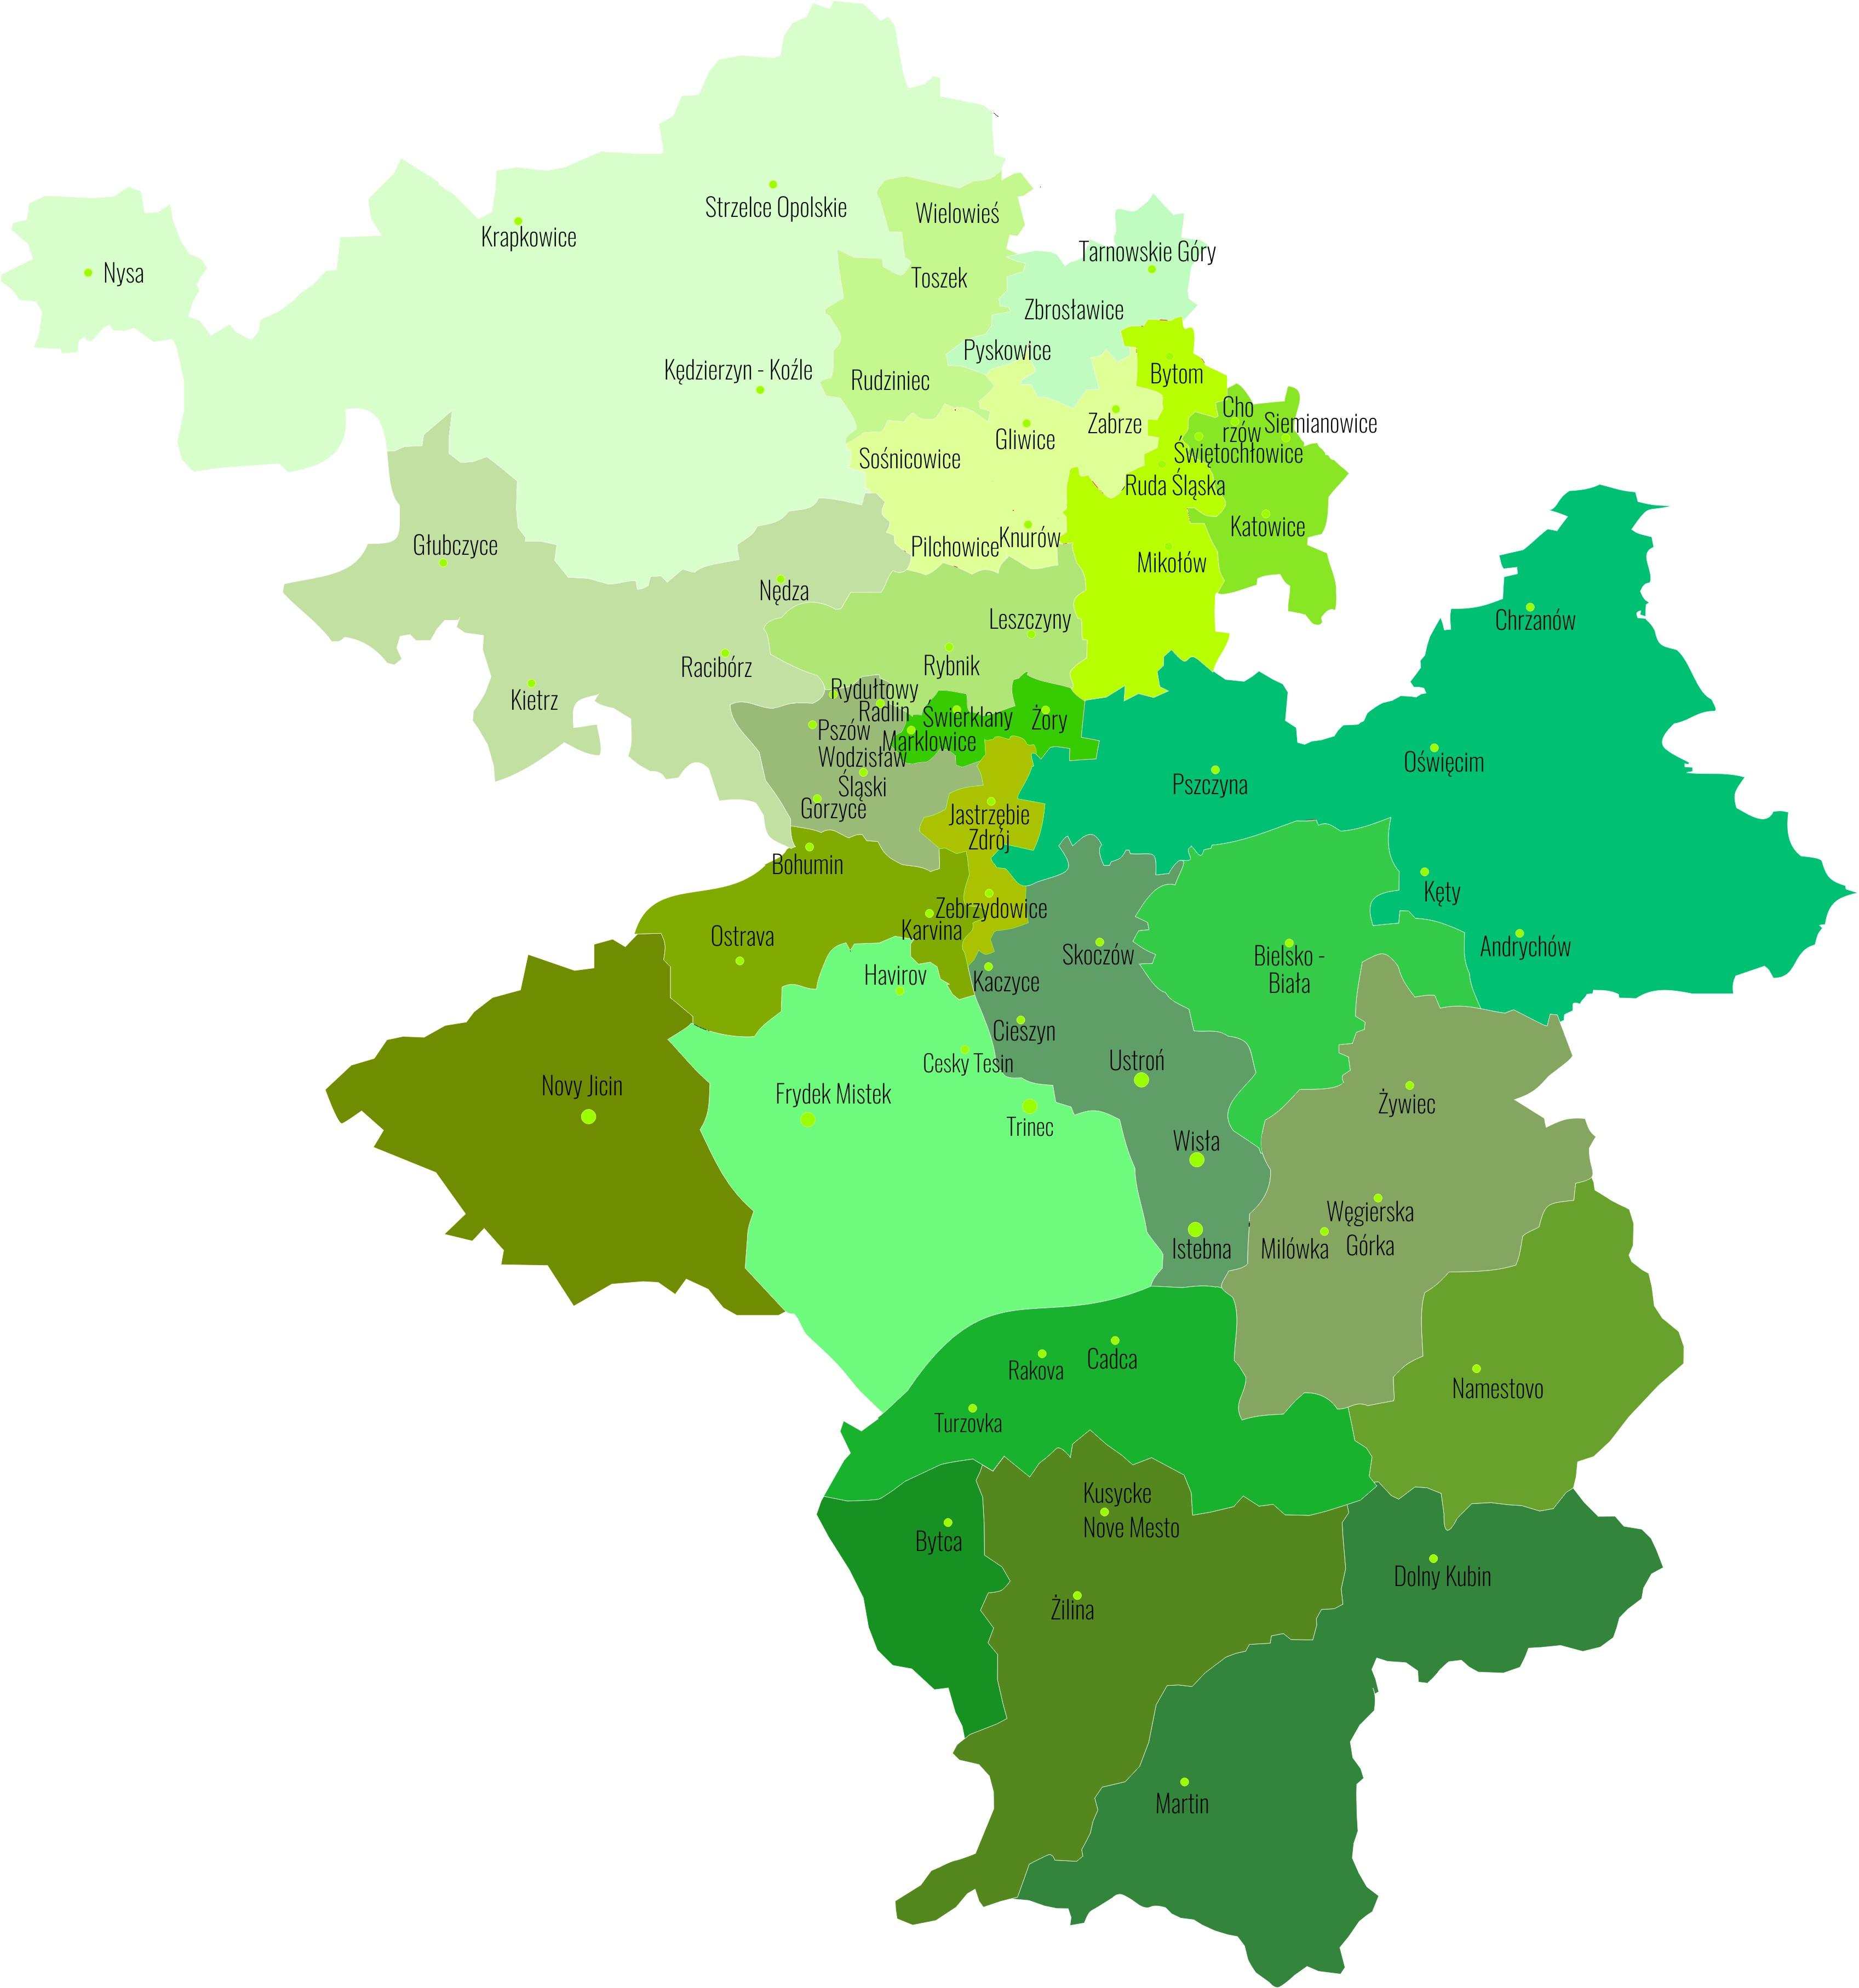 Vanselling: Mapka tras przedstawicieli